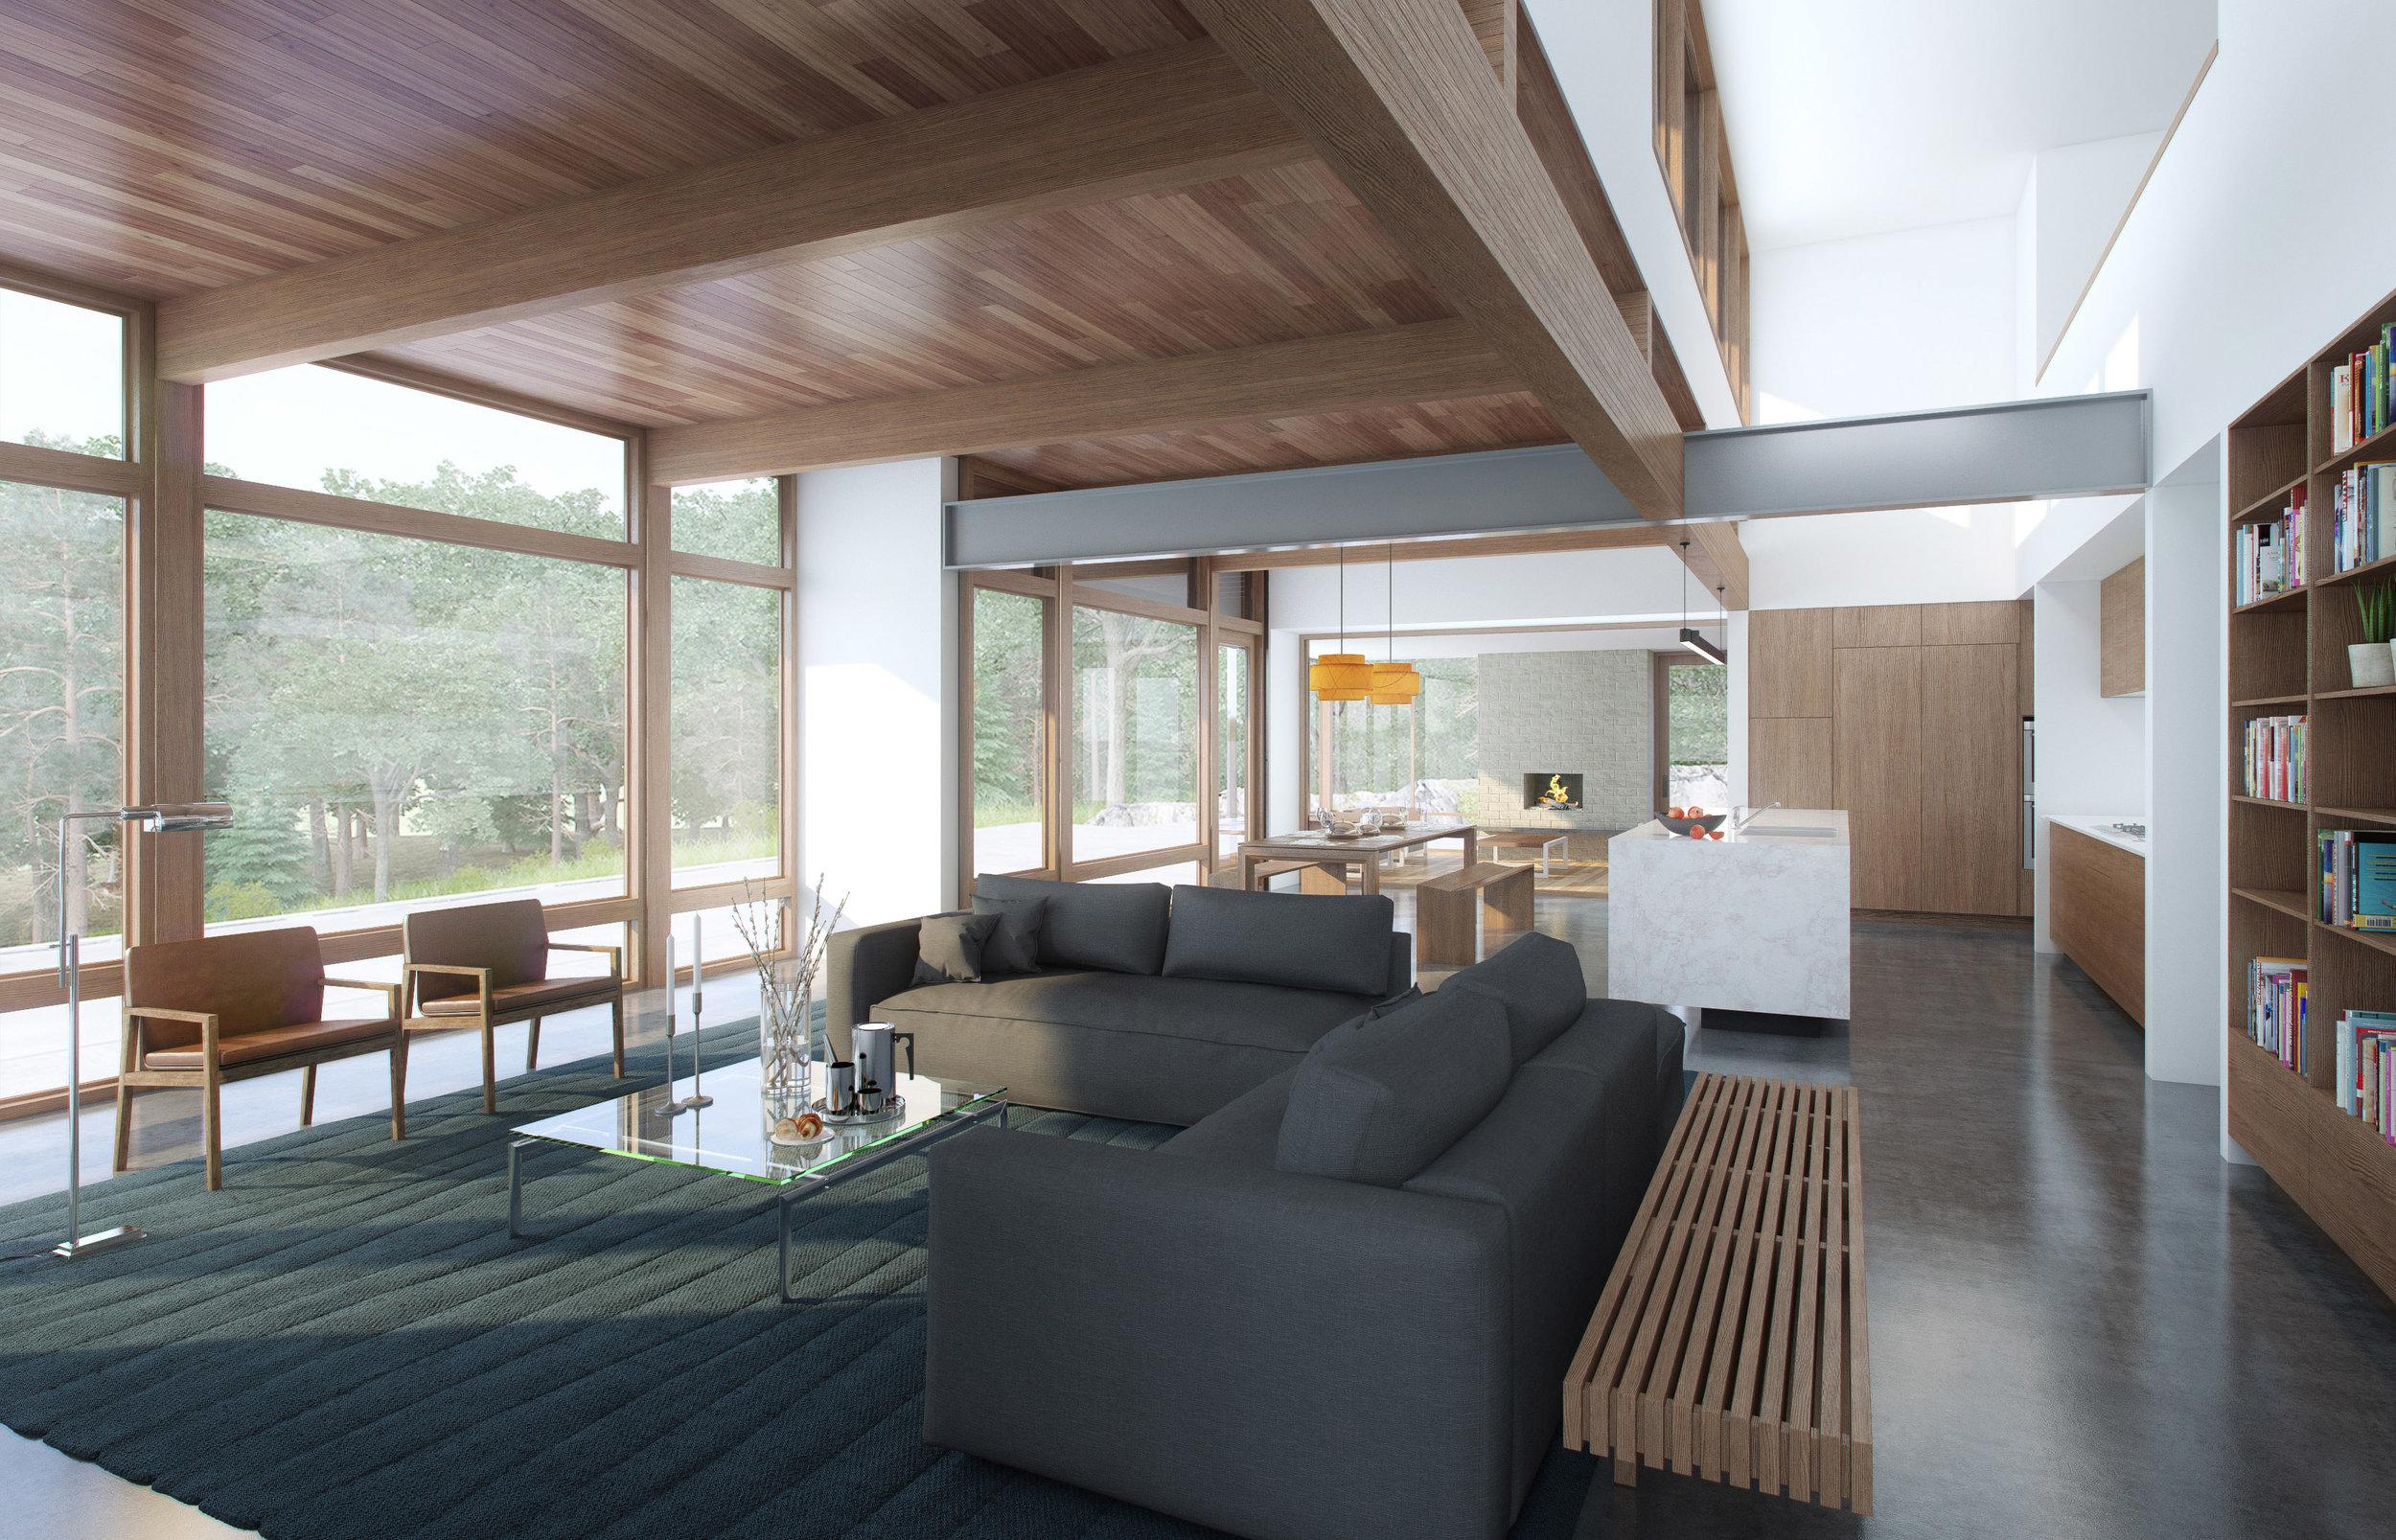 turkel_design_modern_prefab_home_axiom_series_rendering_axiom2790_interior.jpg